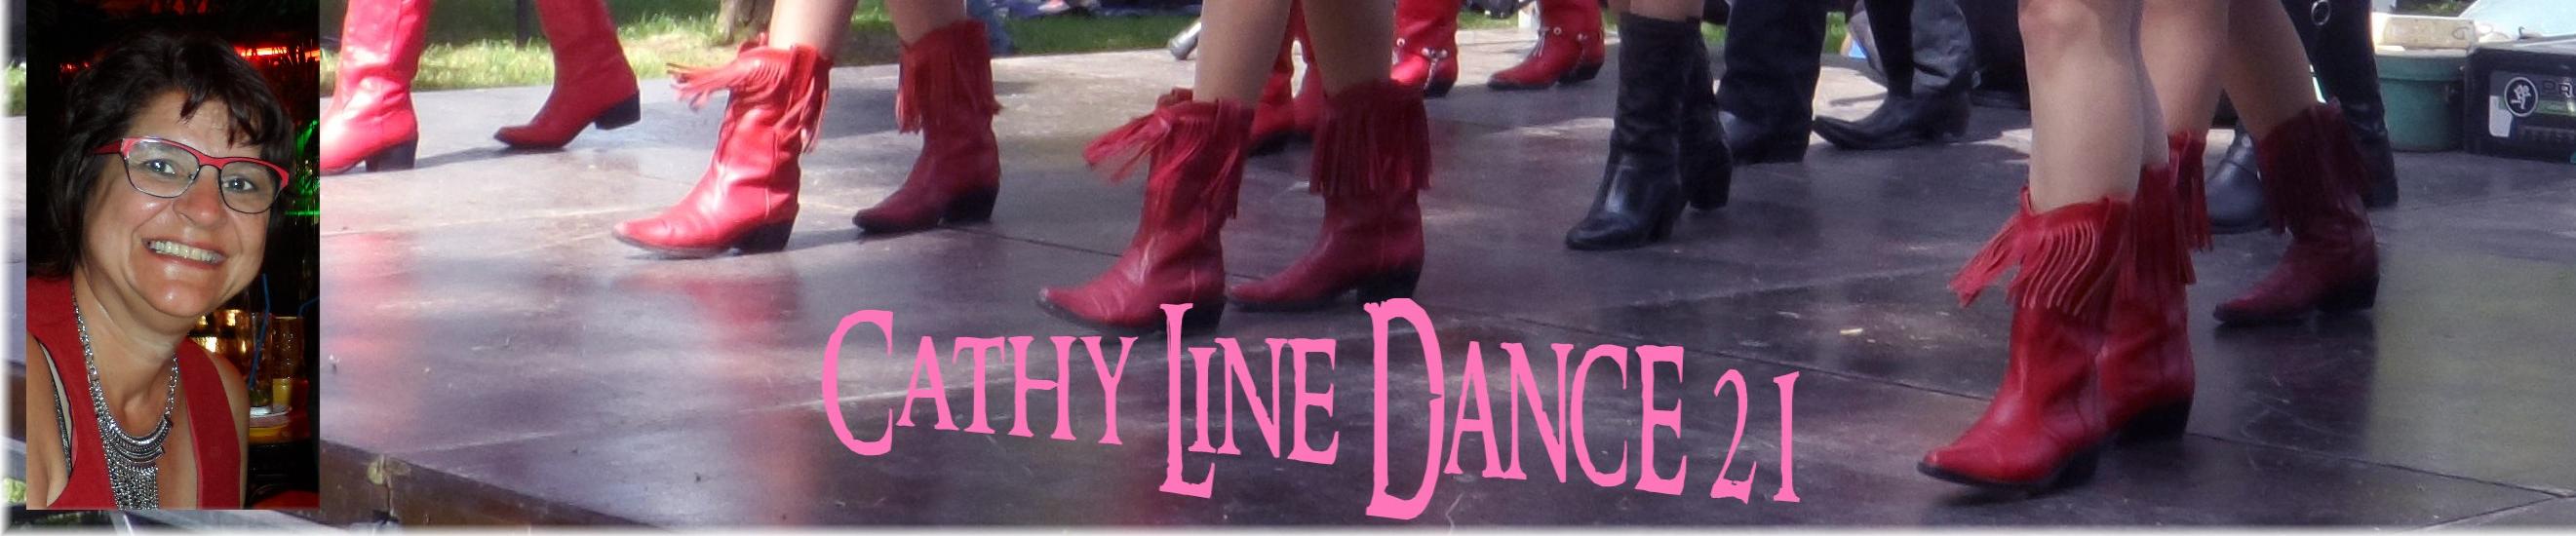 cathy-line-dance-21